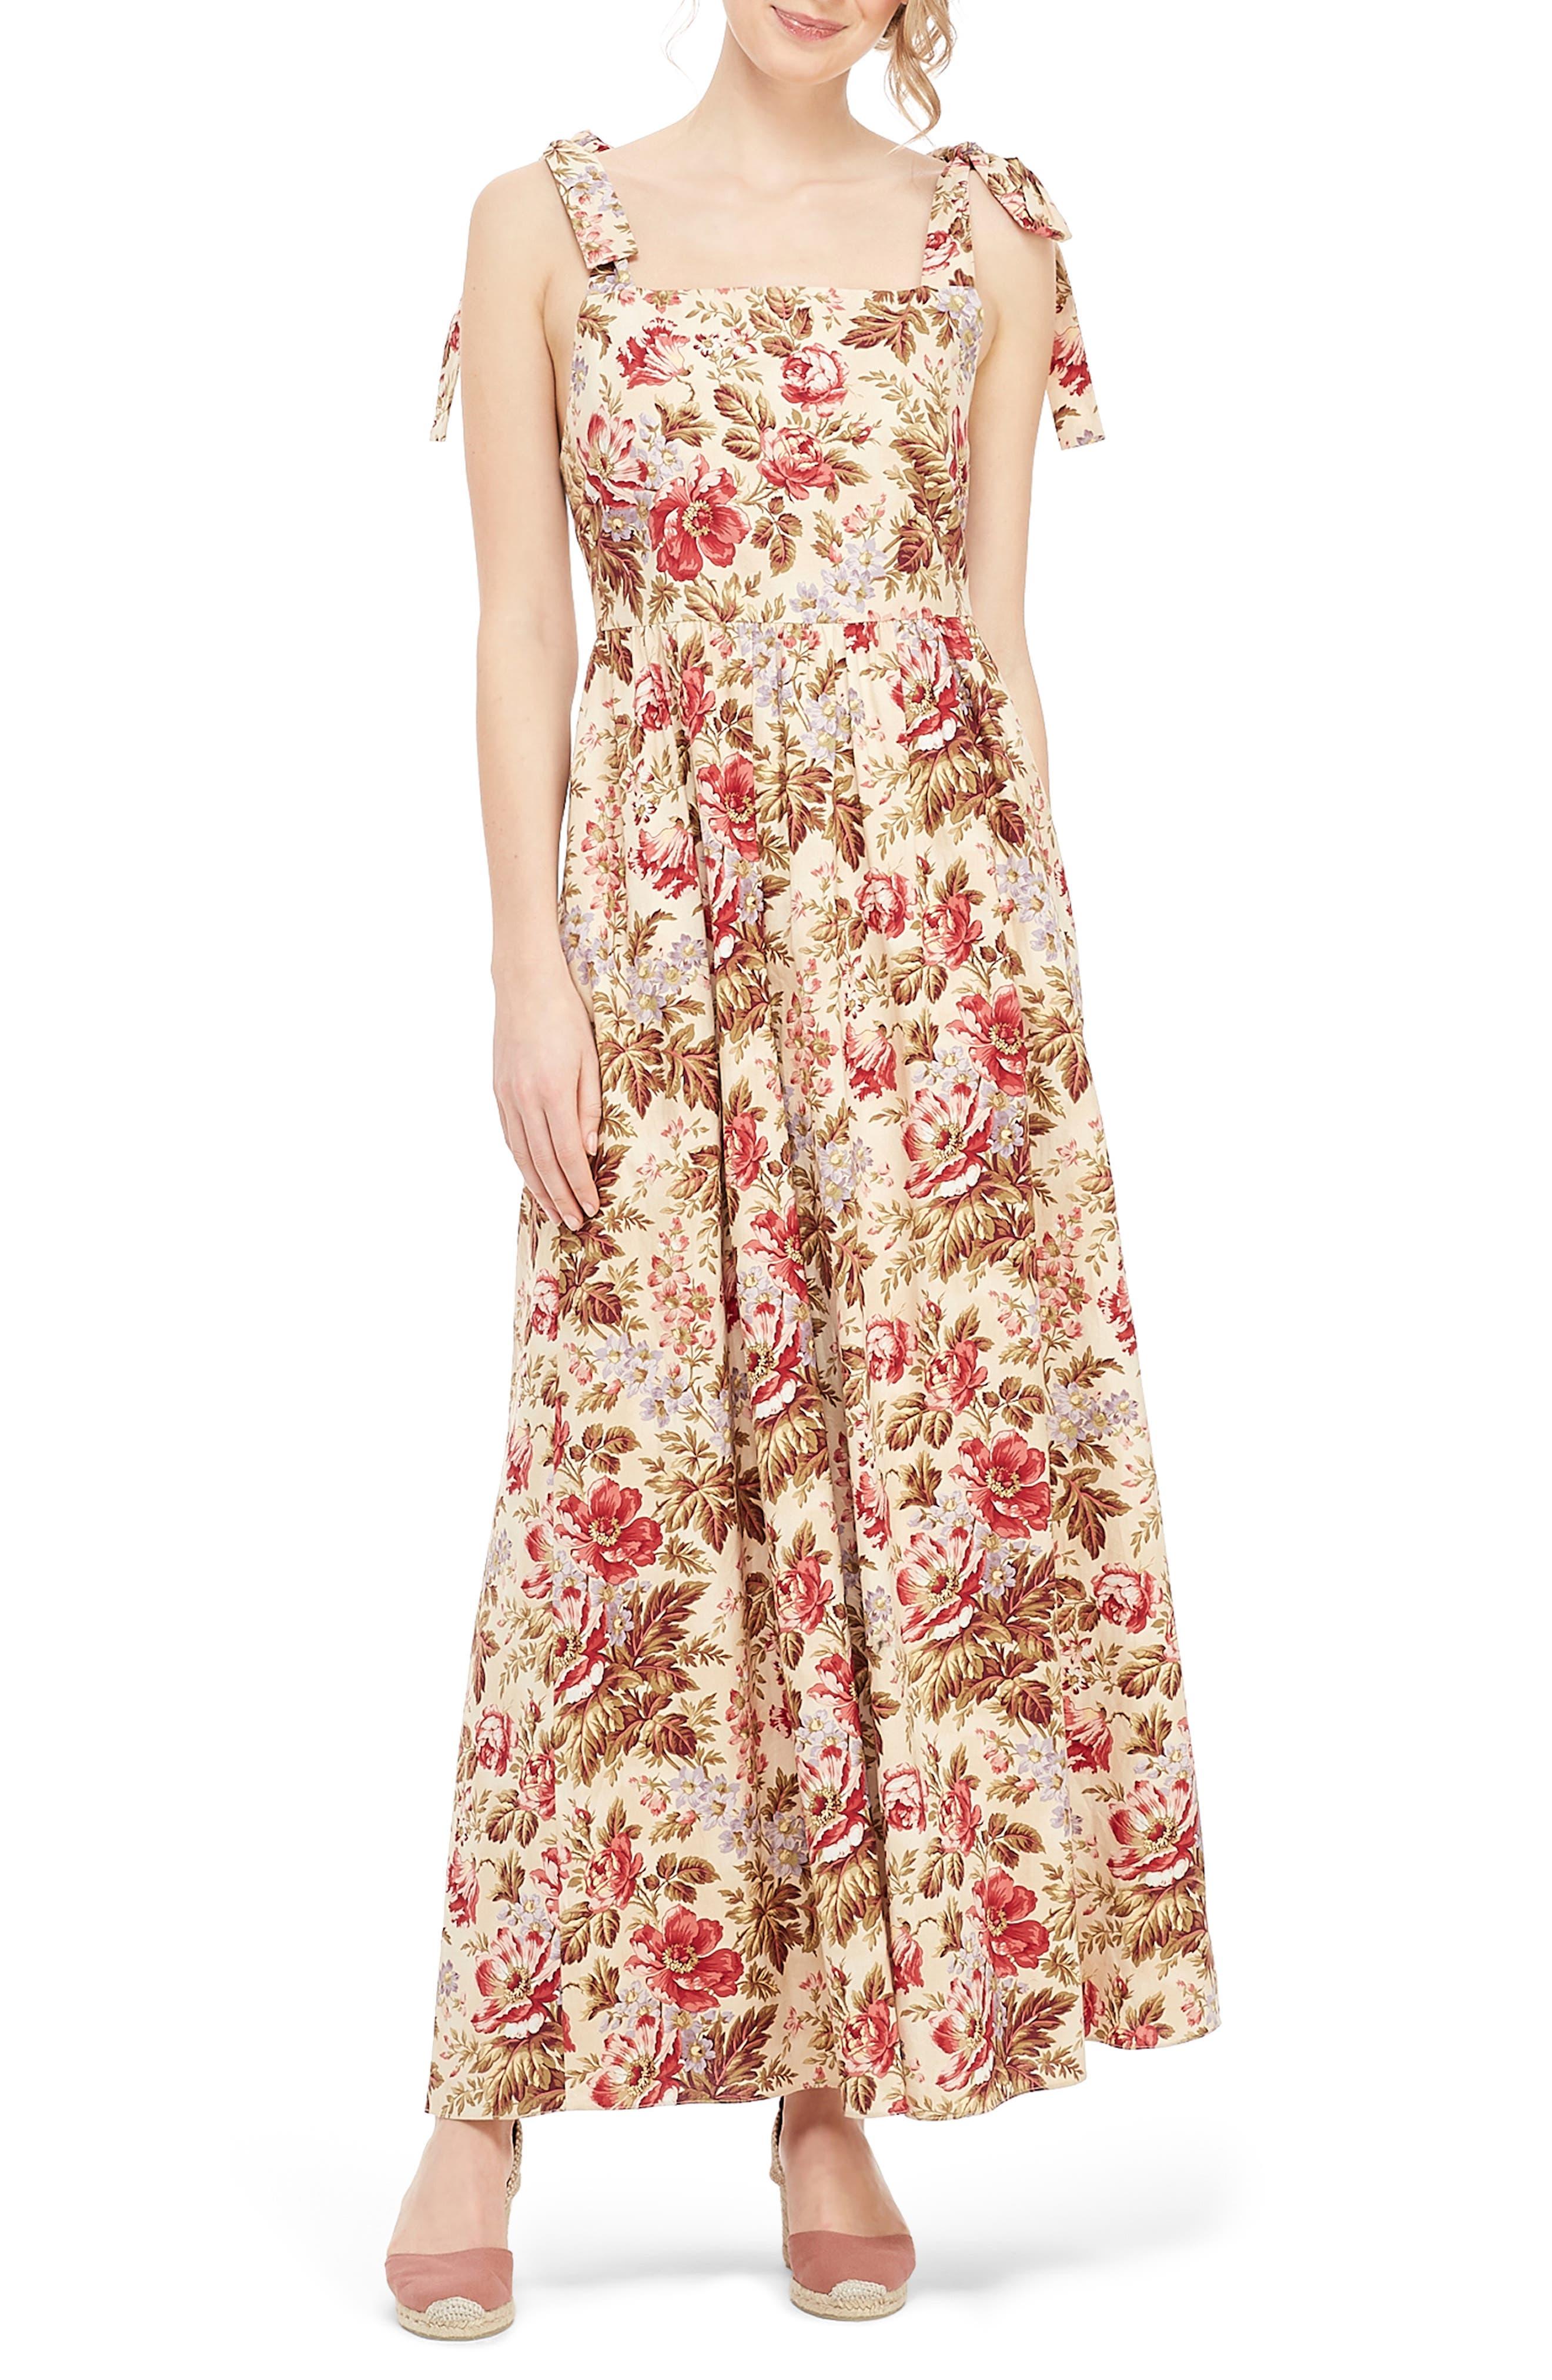 Gal Meets Glam Collection Floral Print Tie Shoulder Cotton Maxi Dress, Beige